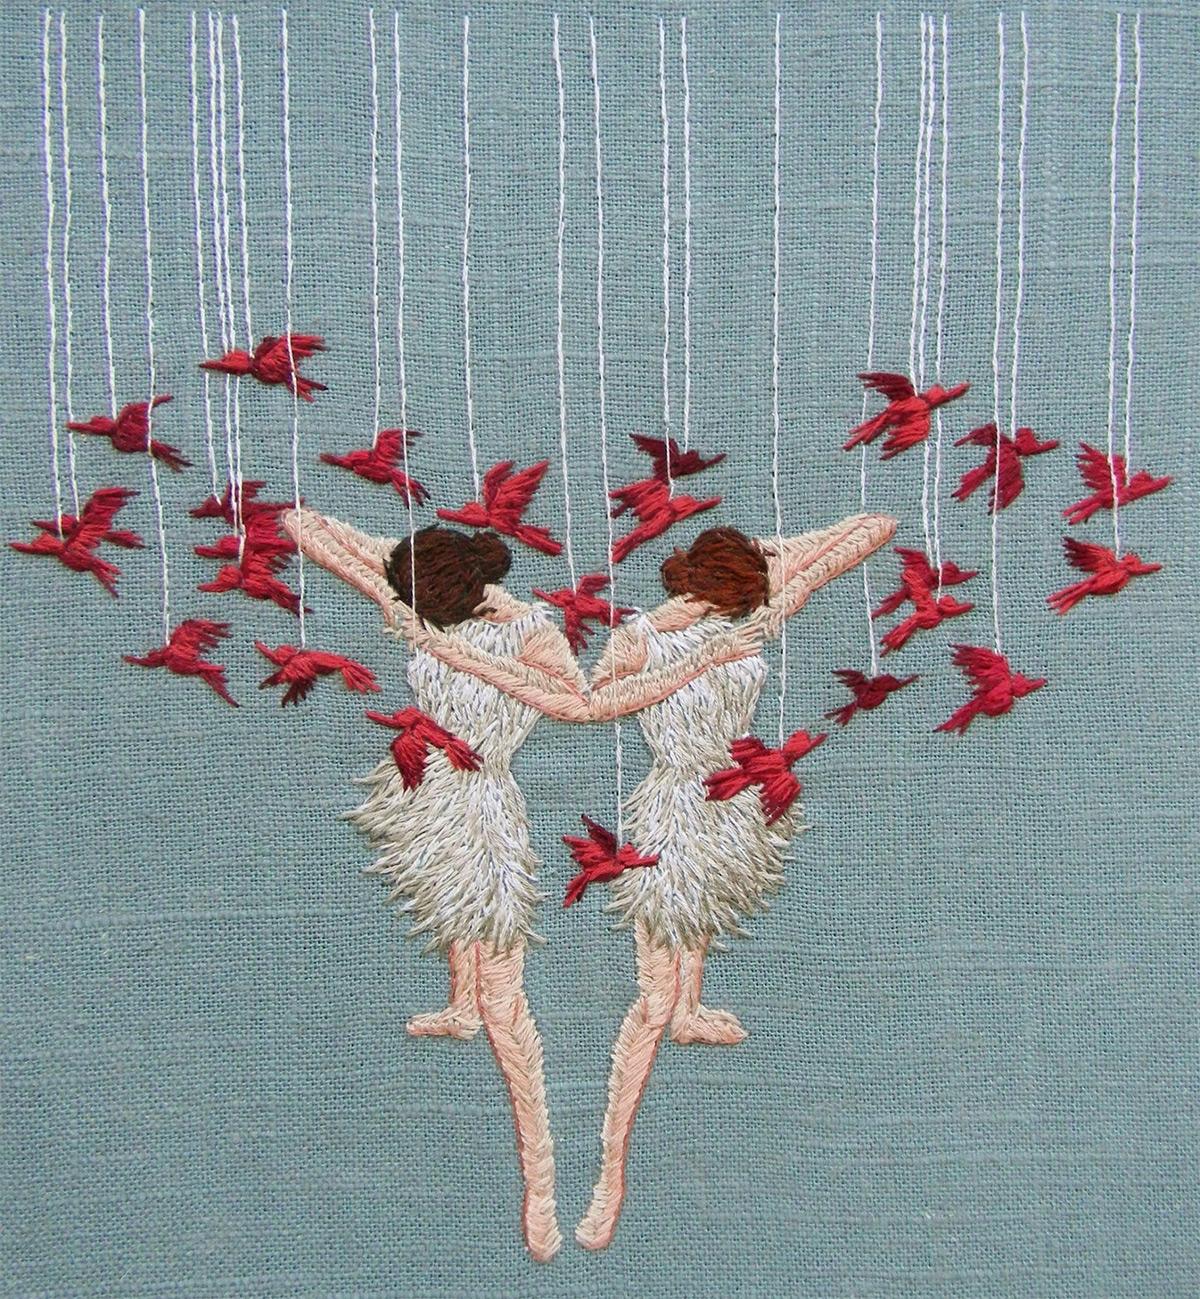 Pájaros, hilos, mujeres